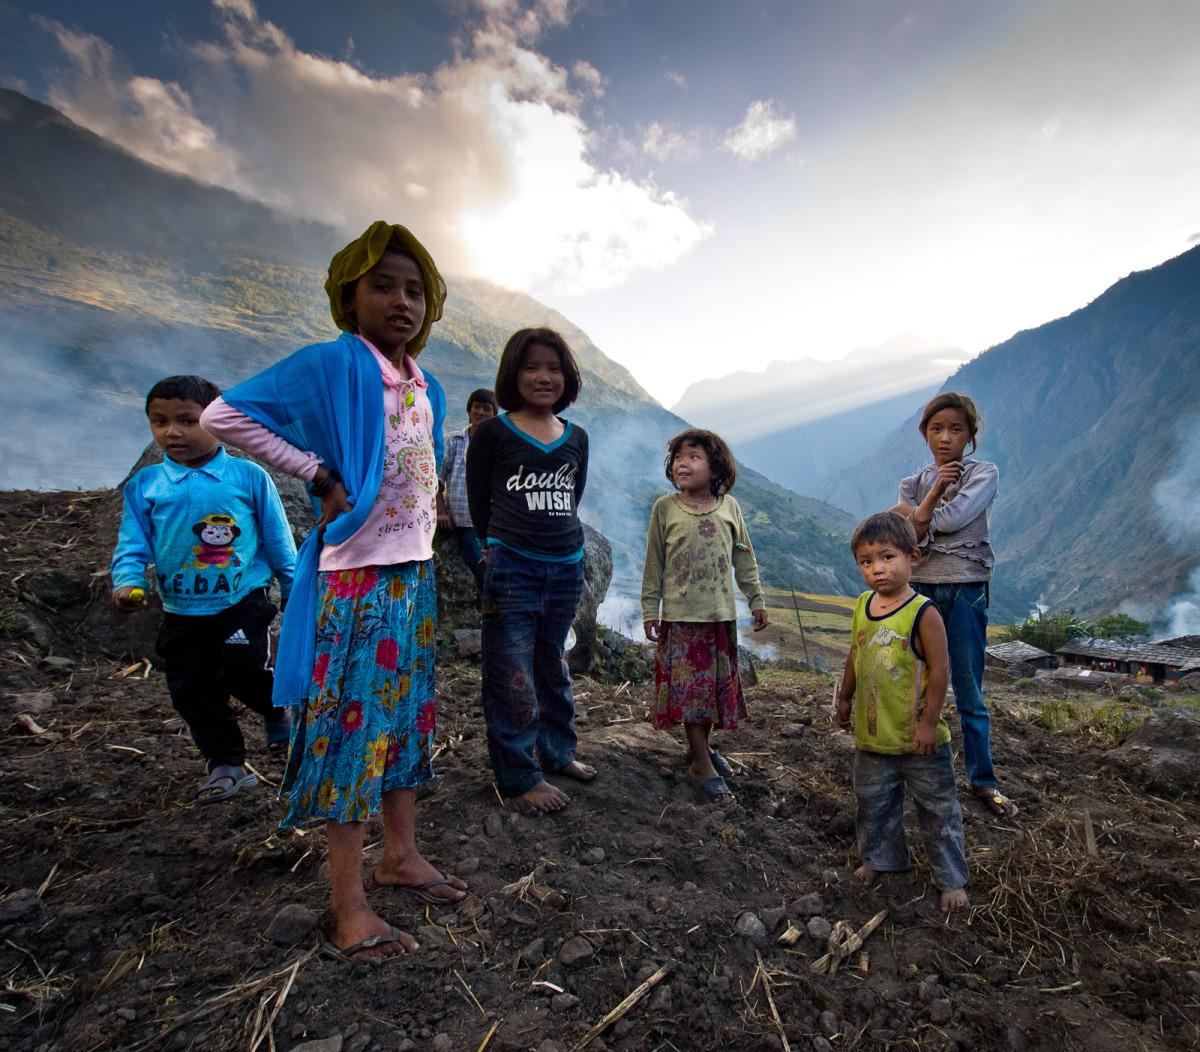 Inquisitive Nepal children